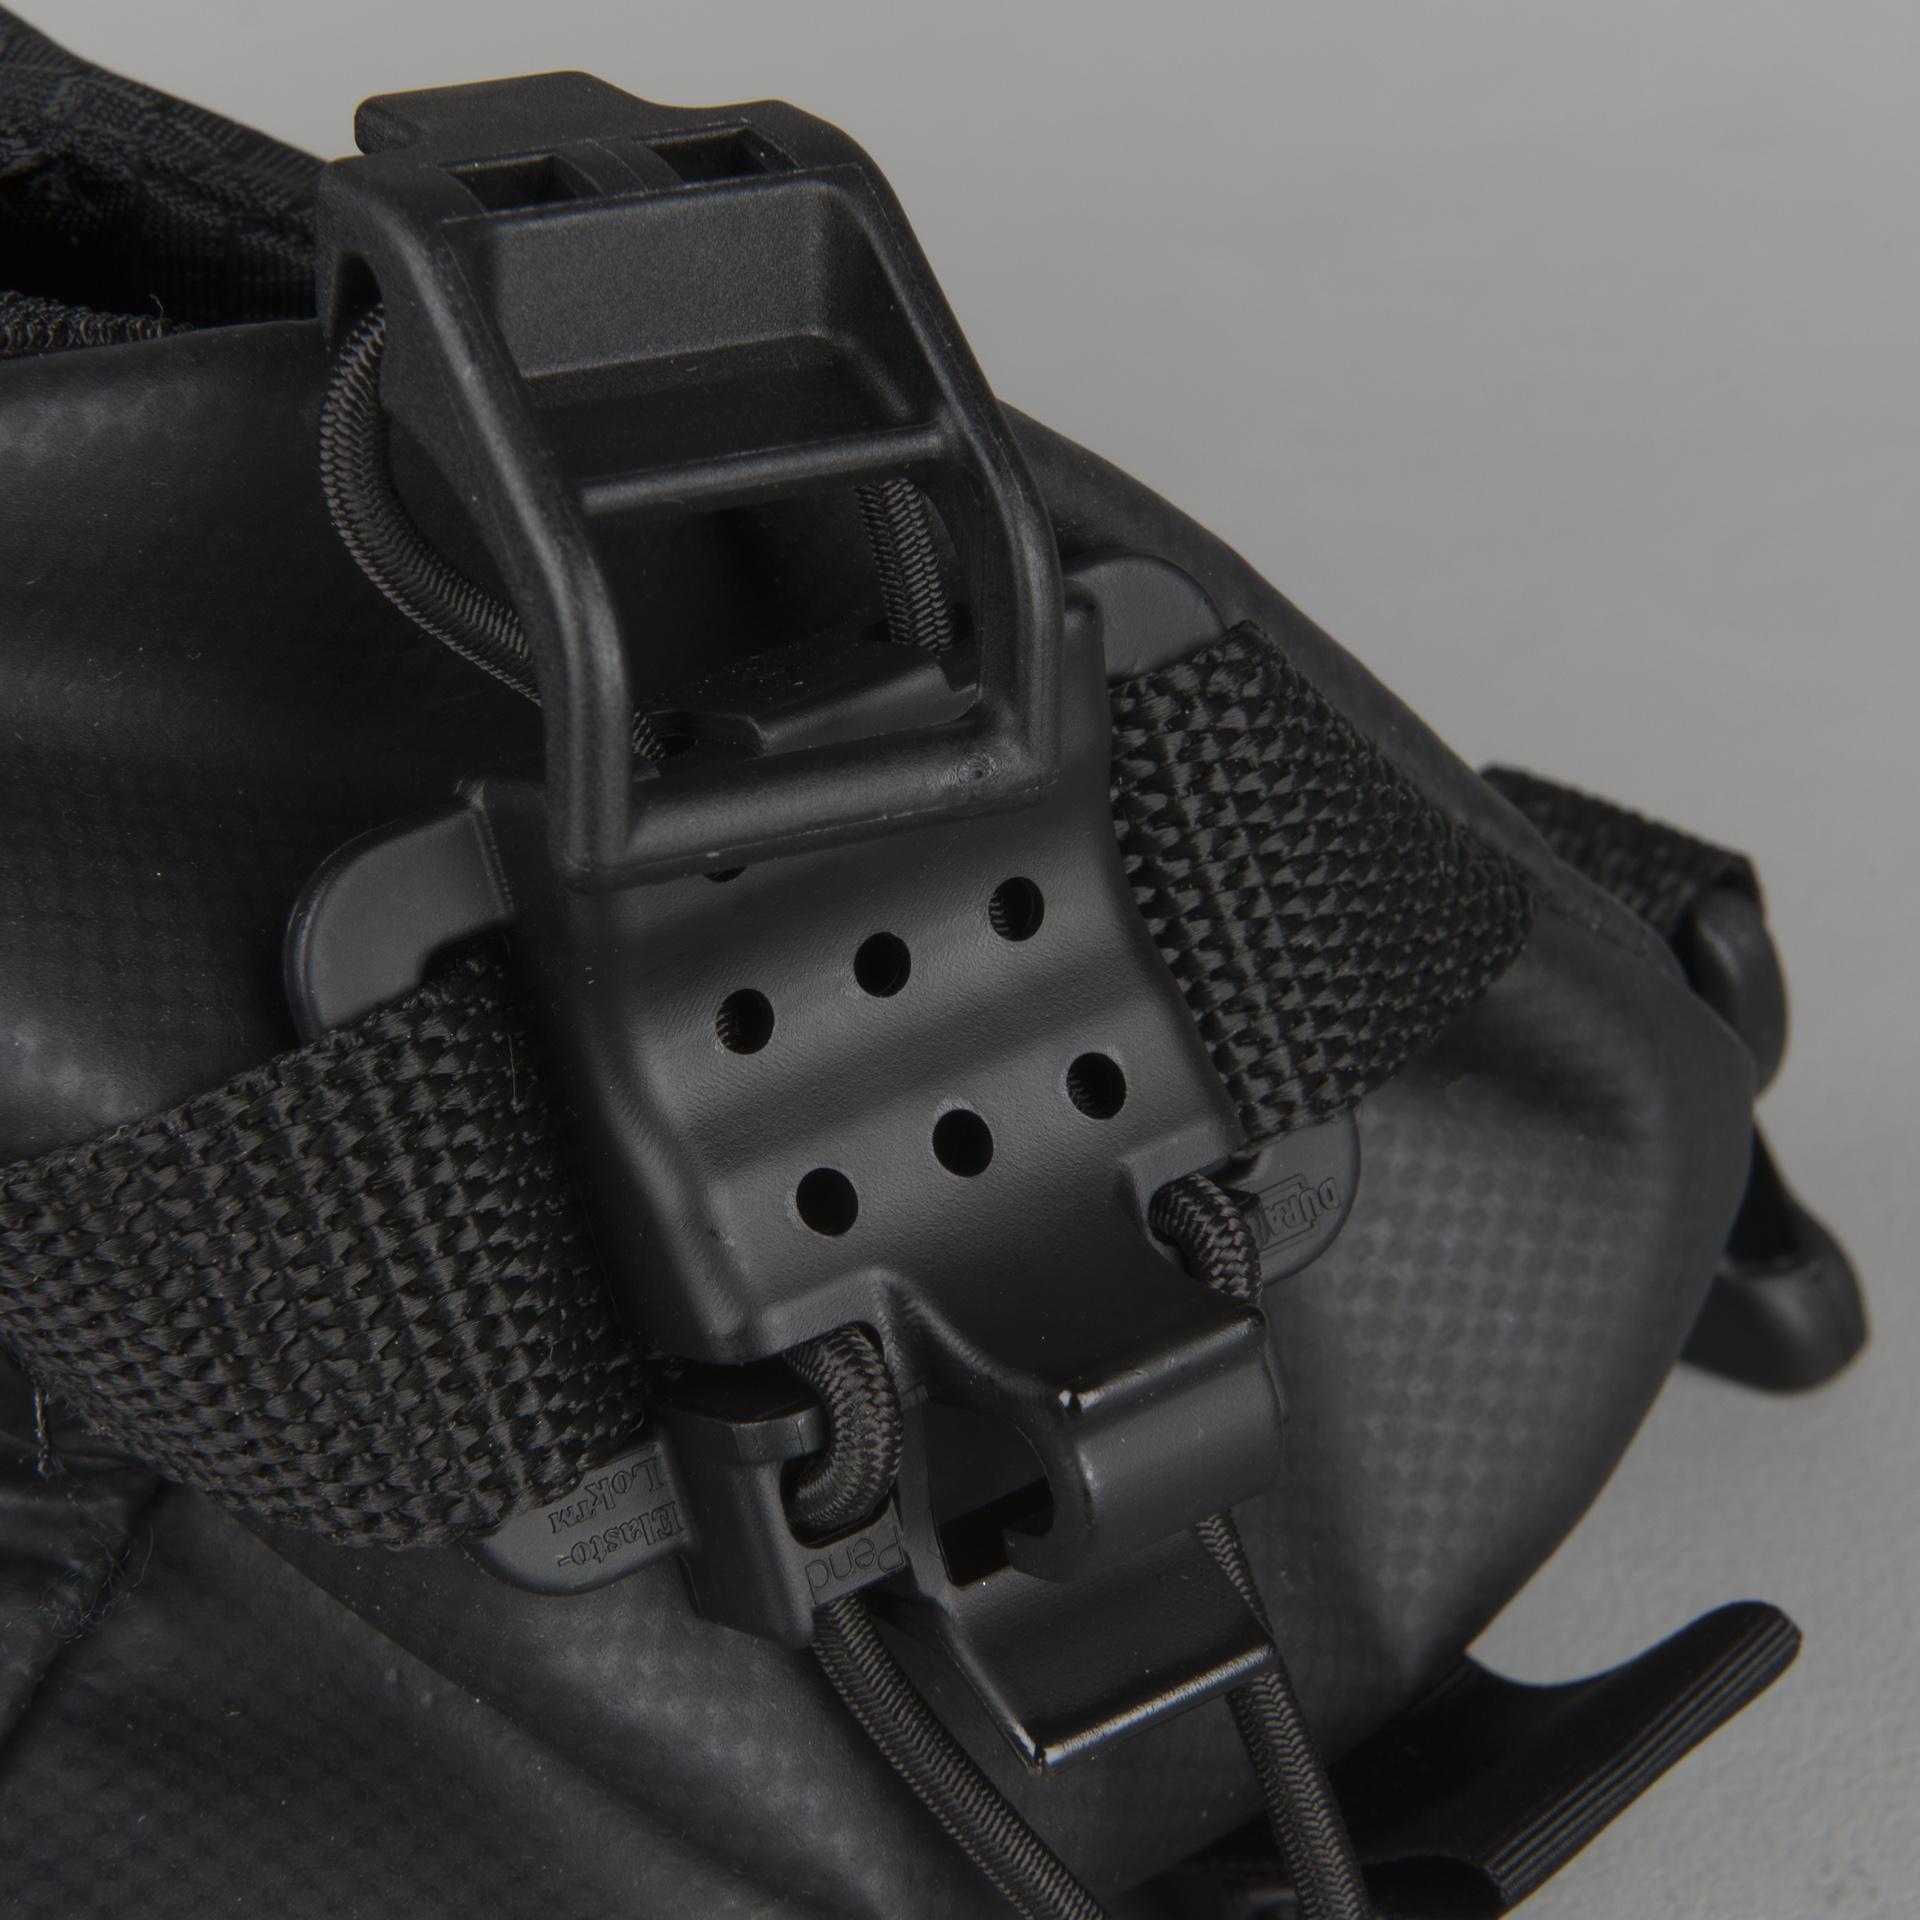 Veske Styre Skinz NXT LVL Polaris Laveste prisgaranti